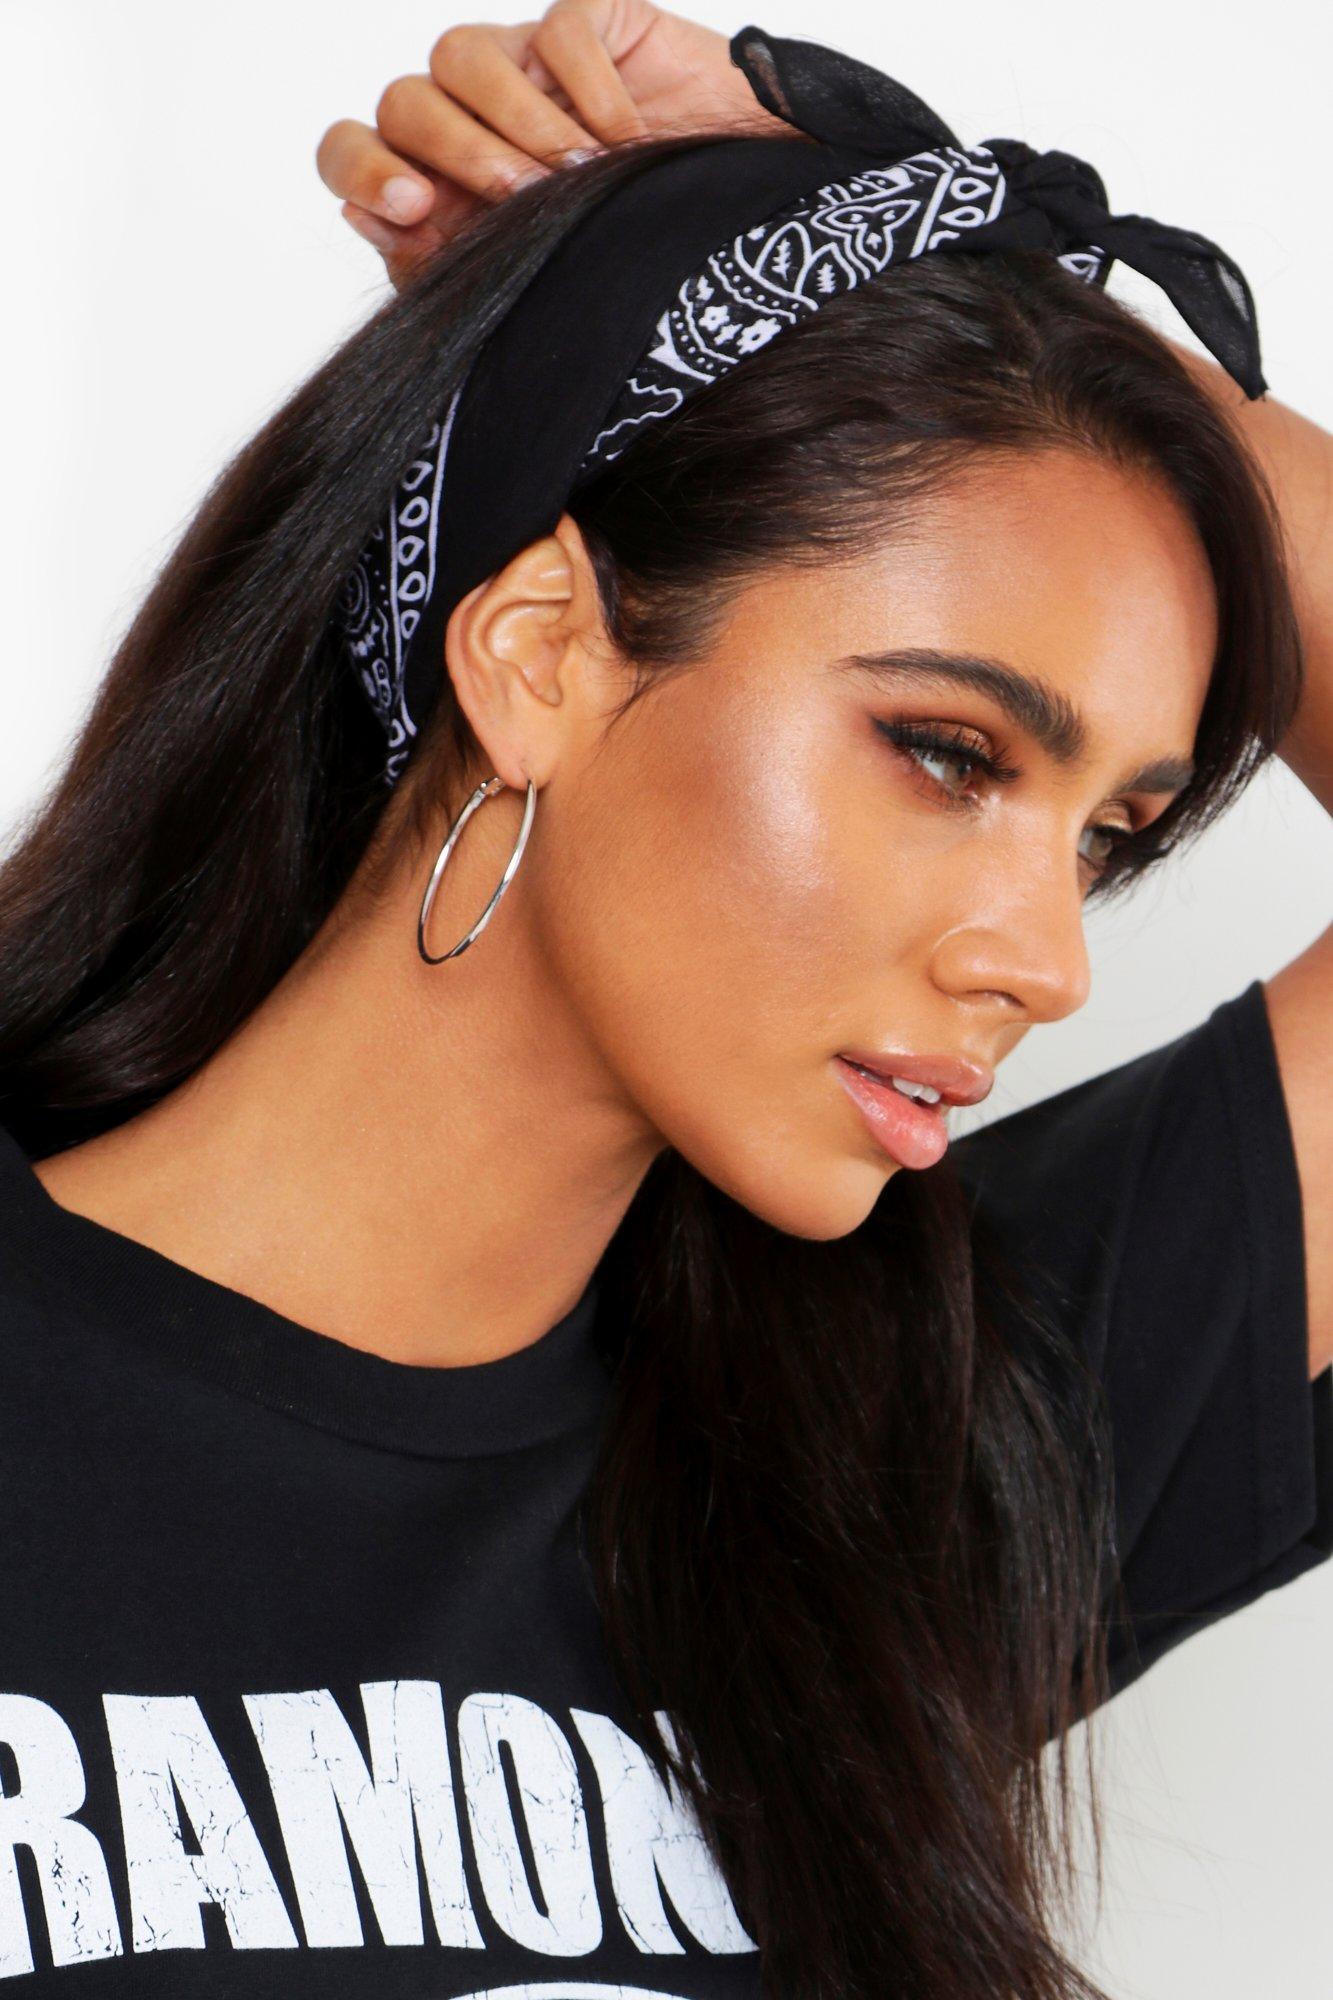 boohoo Womens Bandana Print Headscarf Neckerchief - Black - One Size, Black